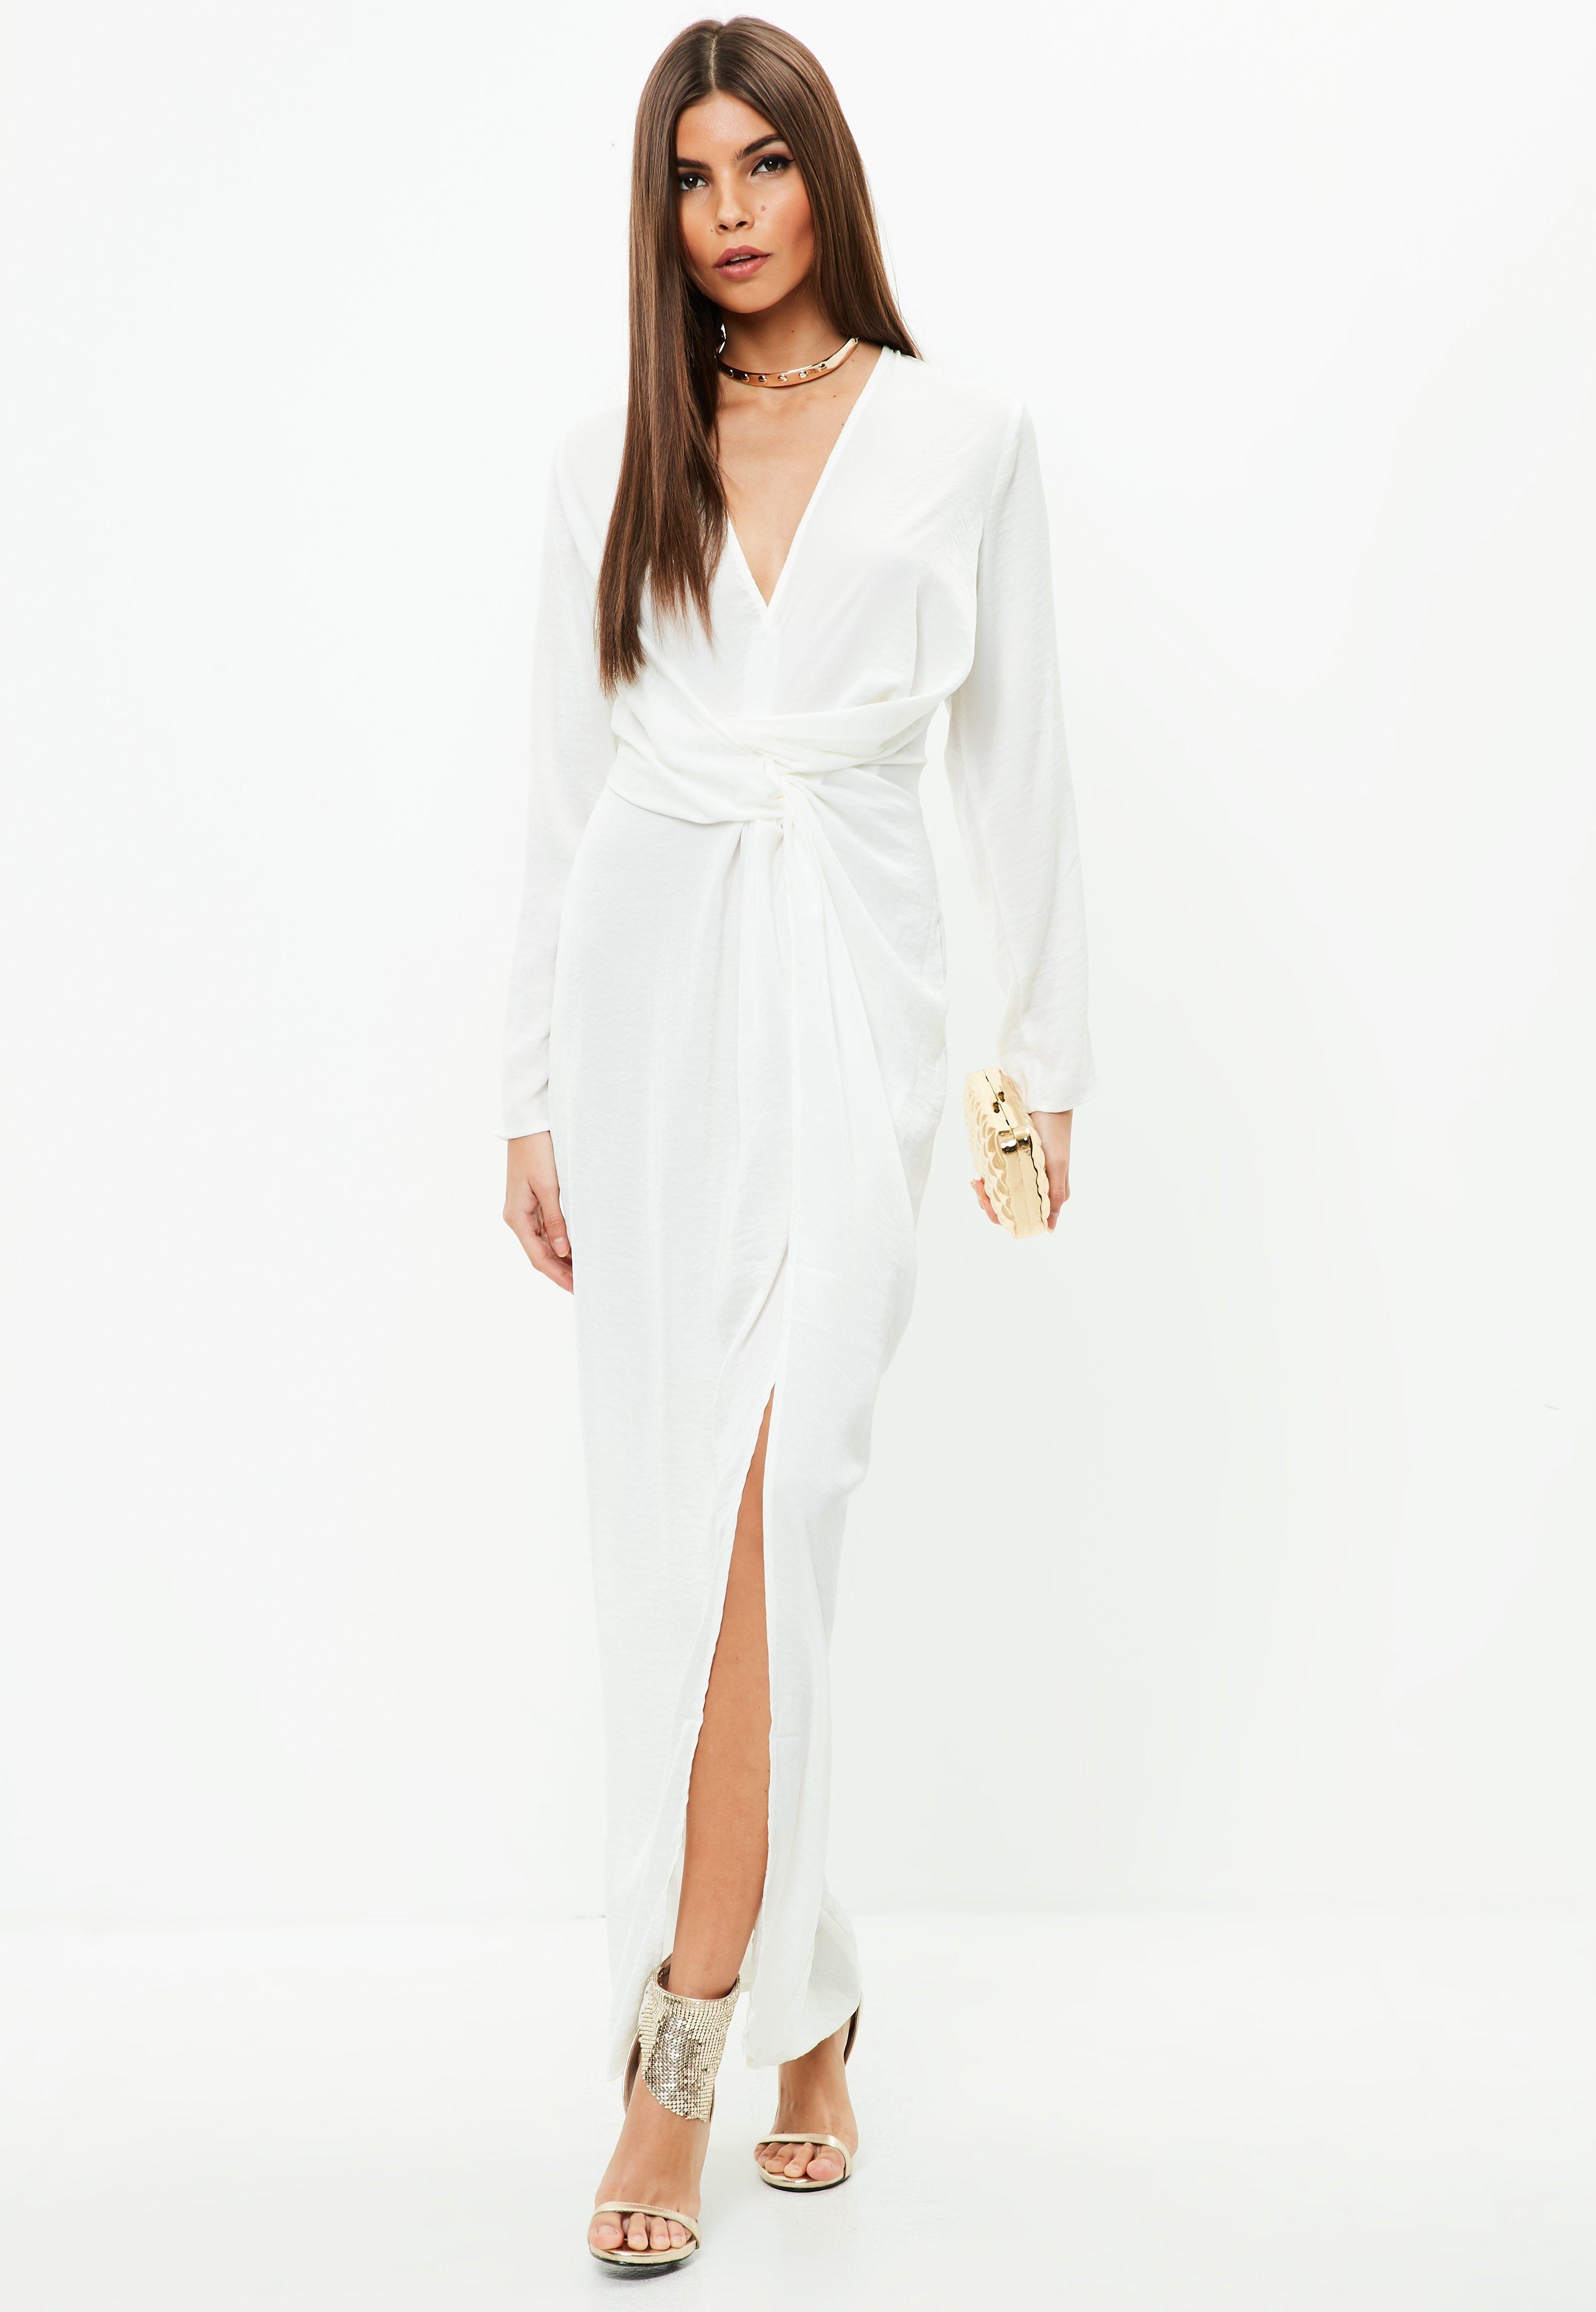 Satinkleider | Seidige Kleider online shoppen - Missguided DE